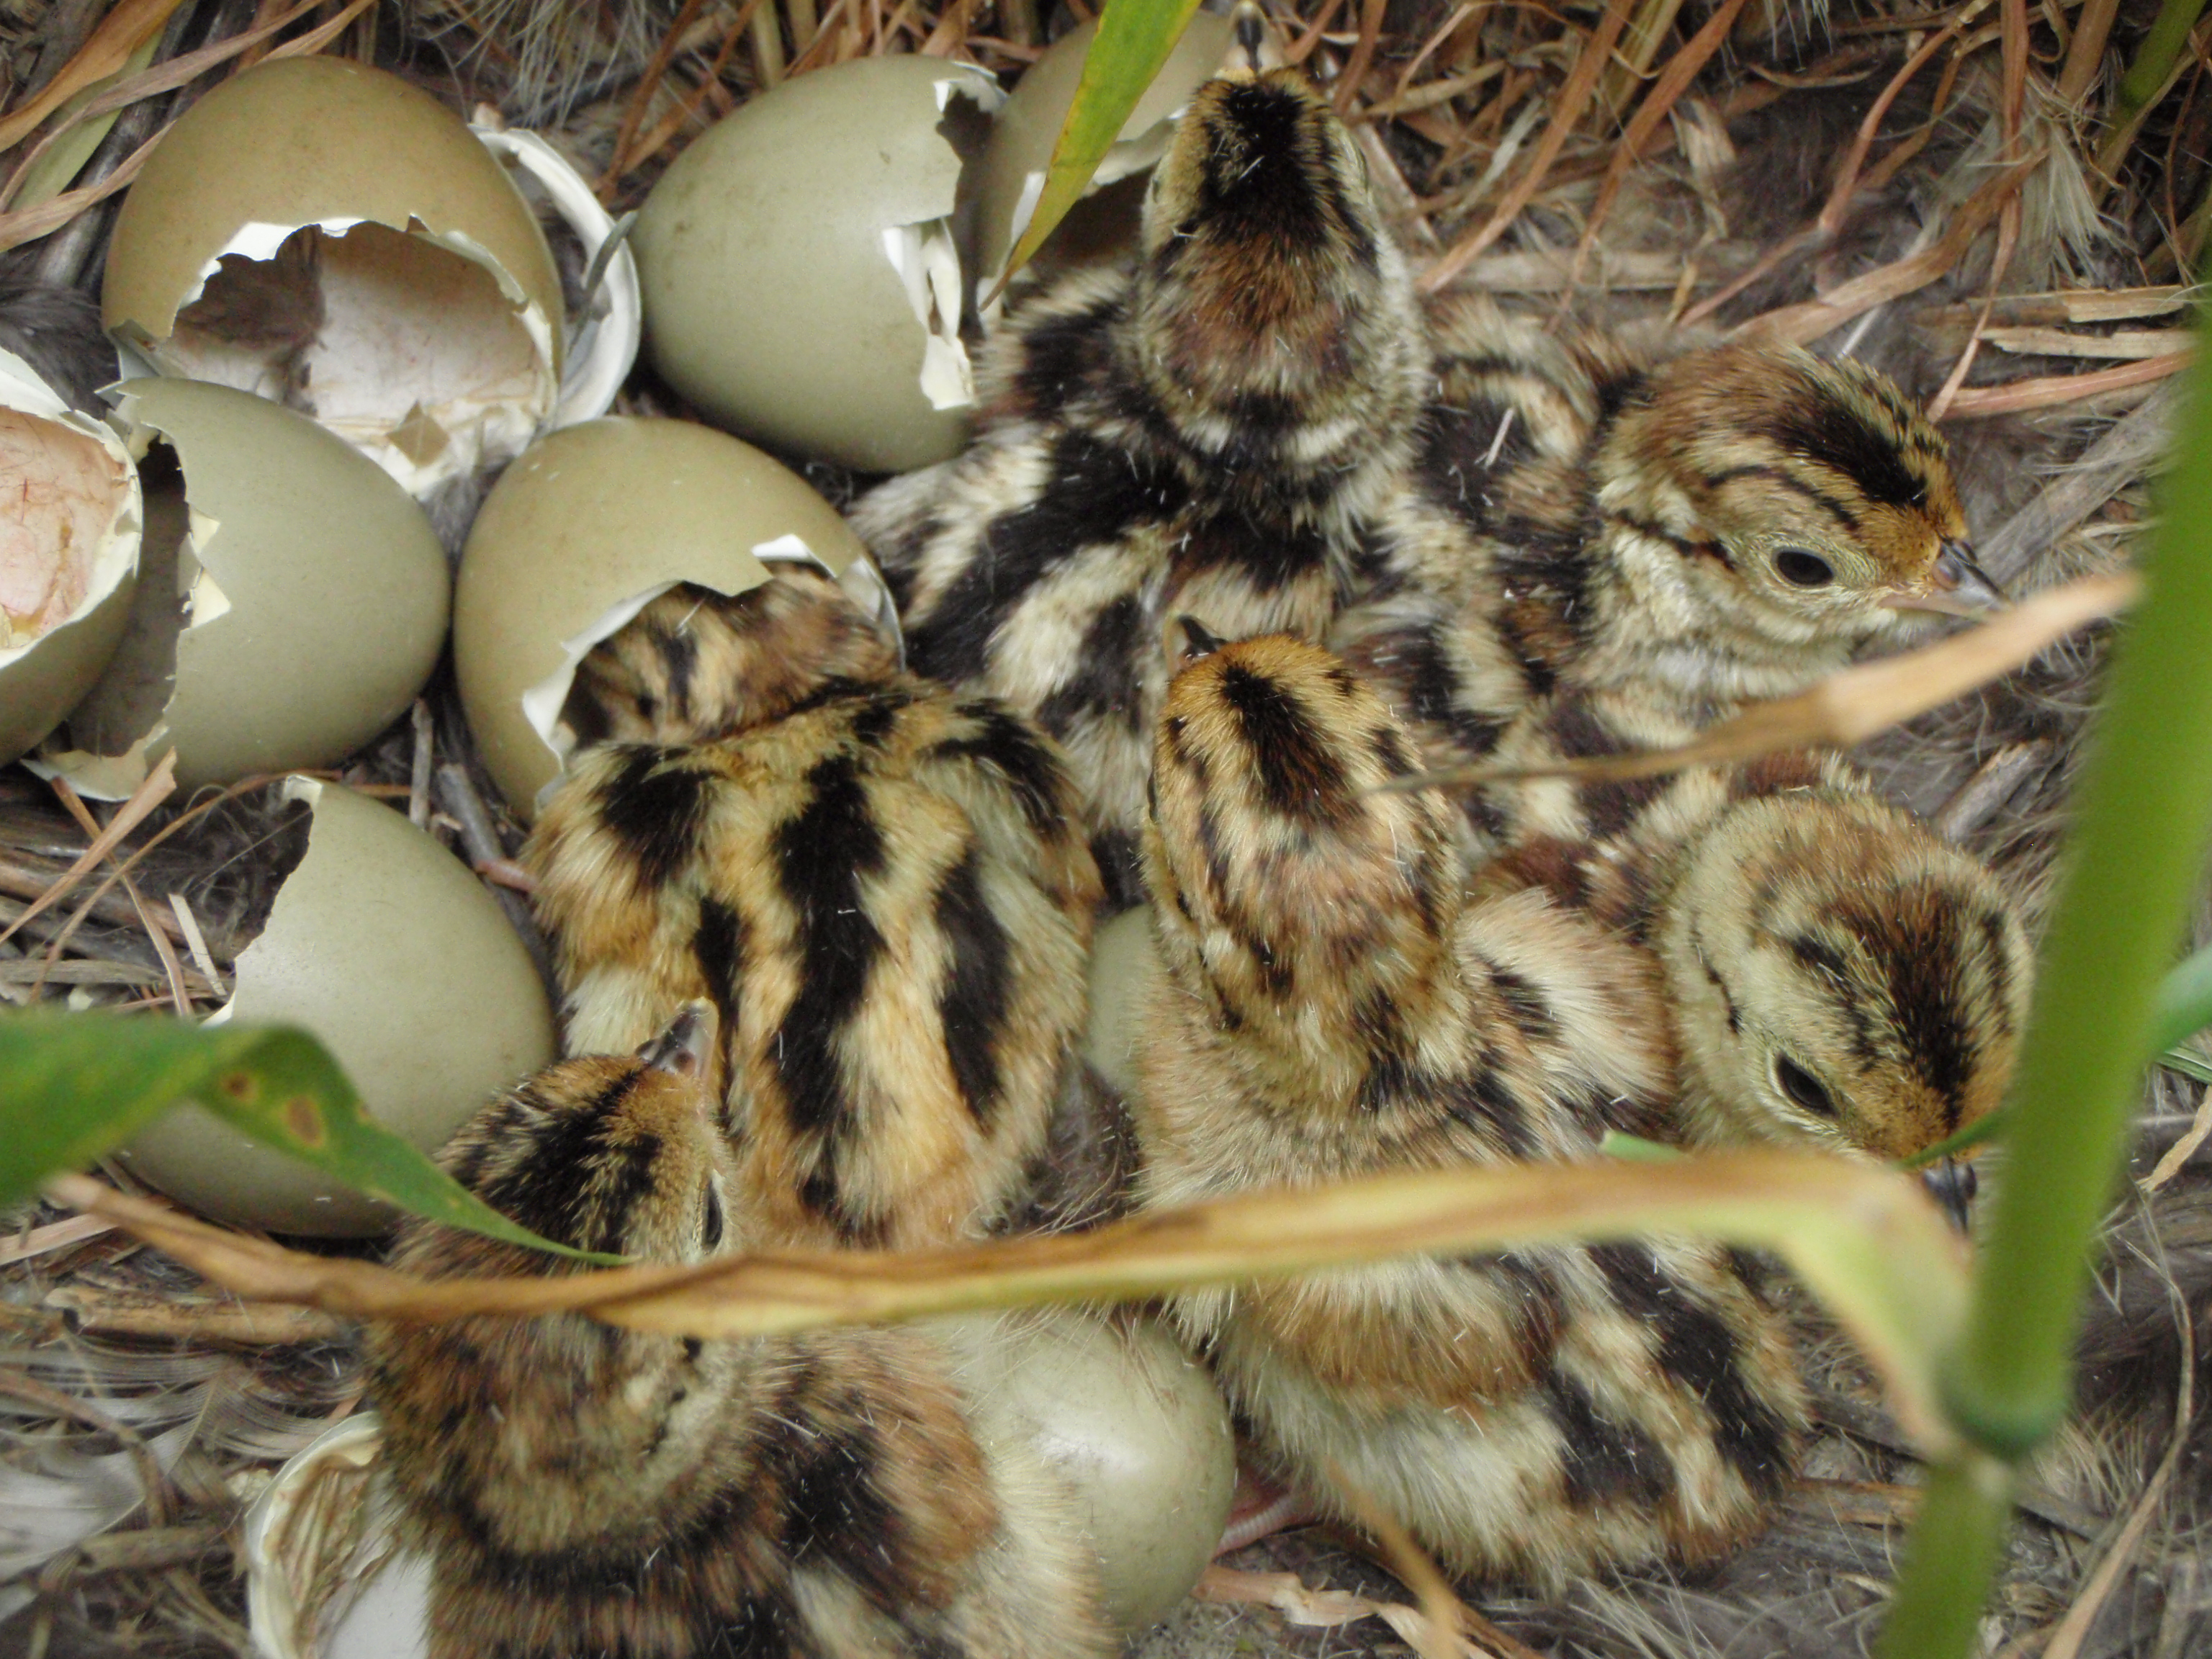 nesting habitat key to pheasant numbers